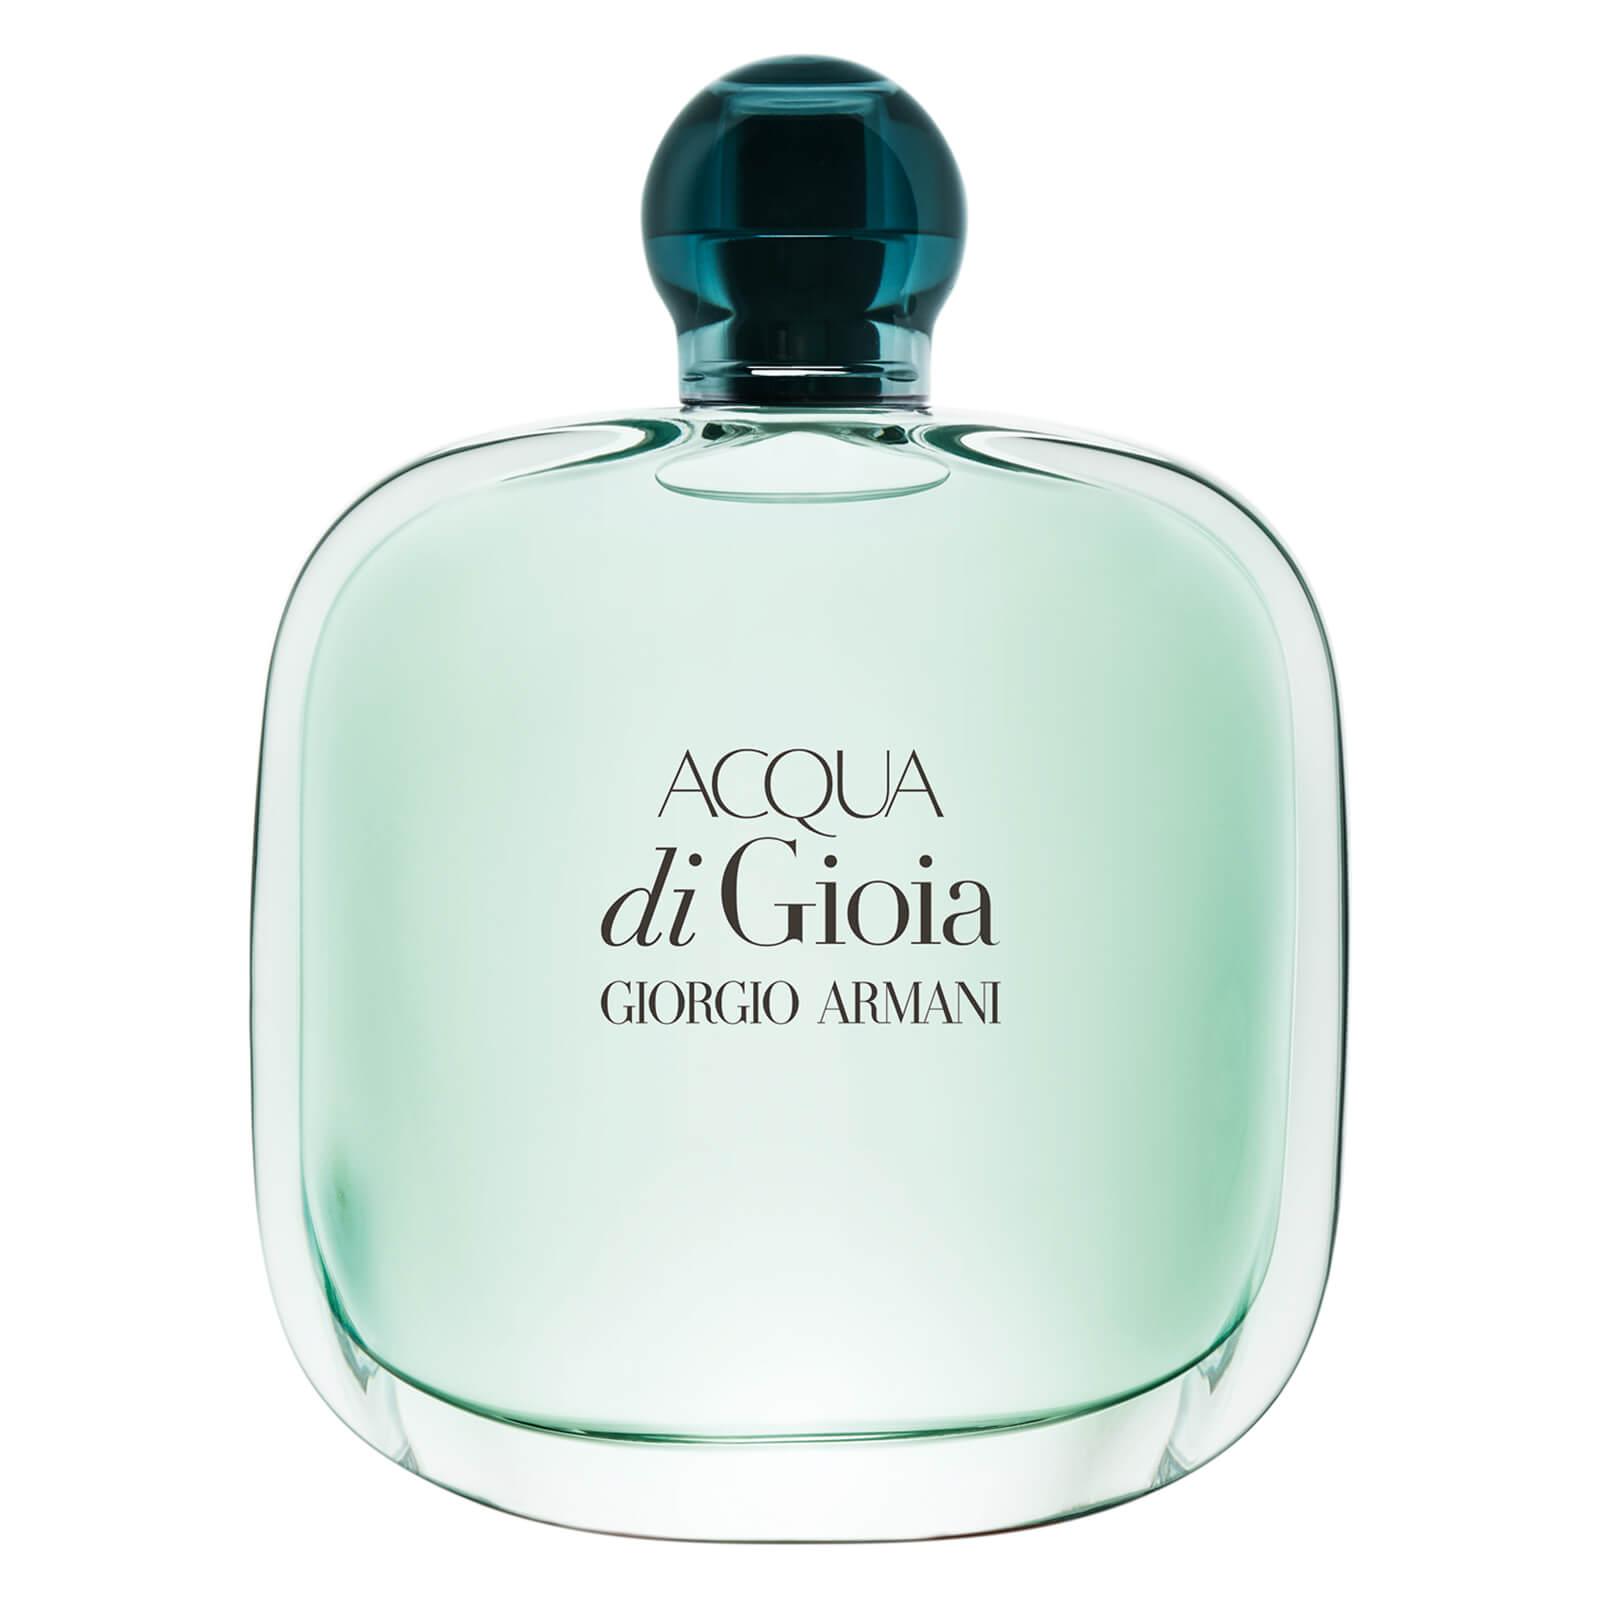 Giorgio Armani Acqua Di Gioia Eau de Parfum - 100ml